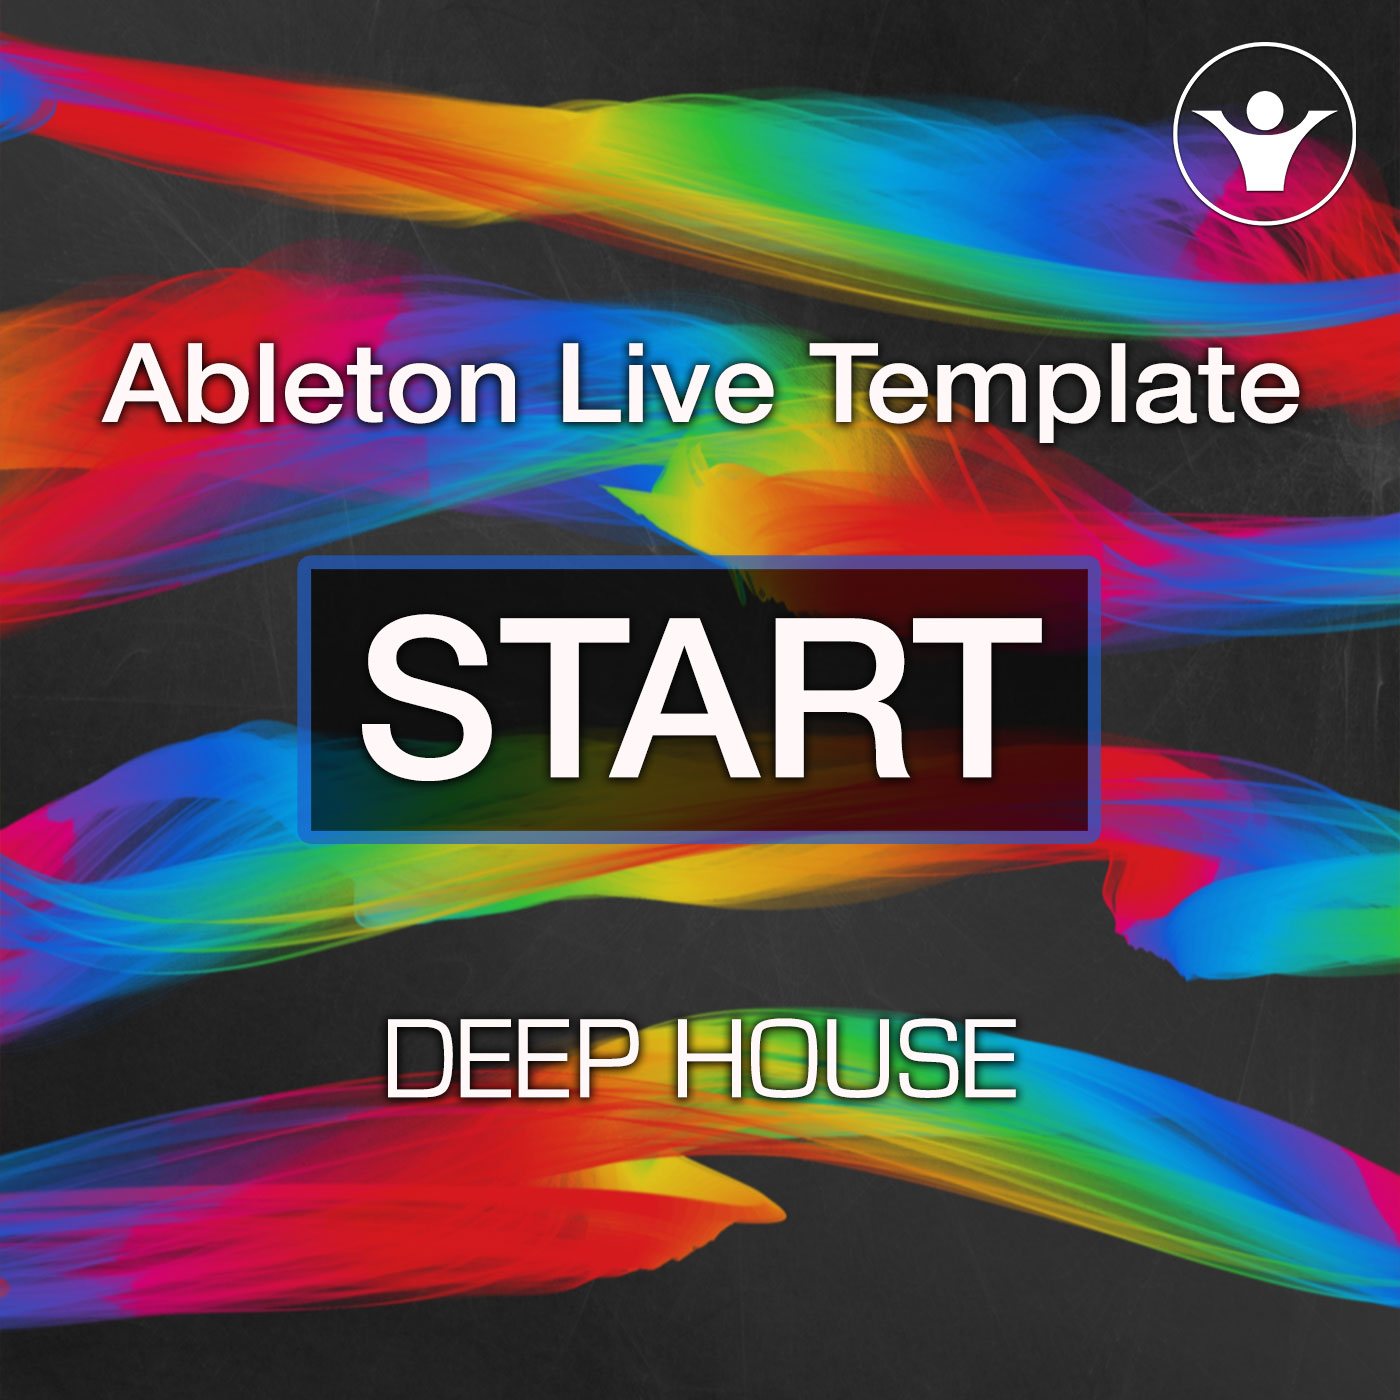 Free Ableton Live Templates Images - Template Design Ideas